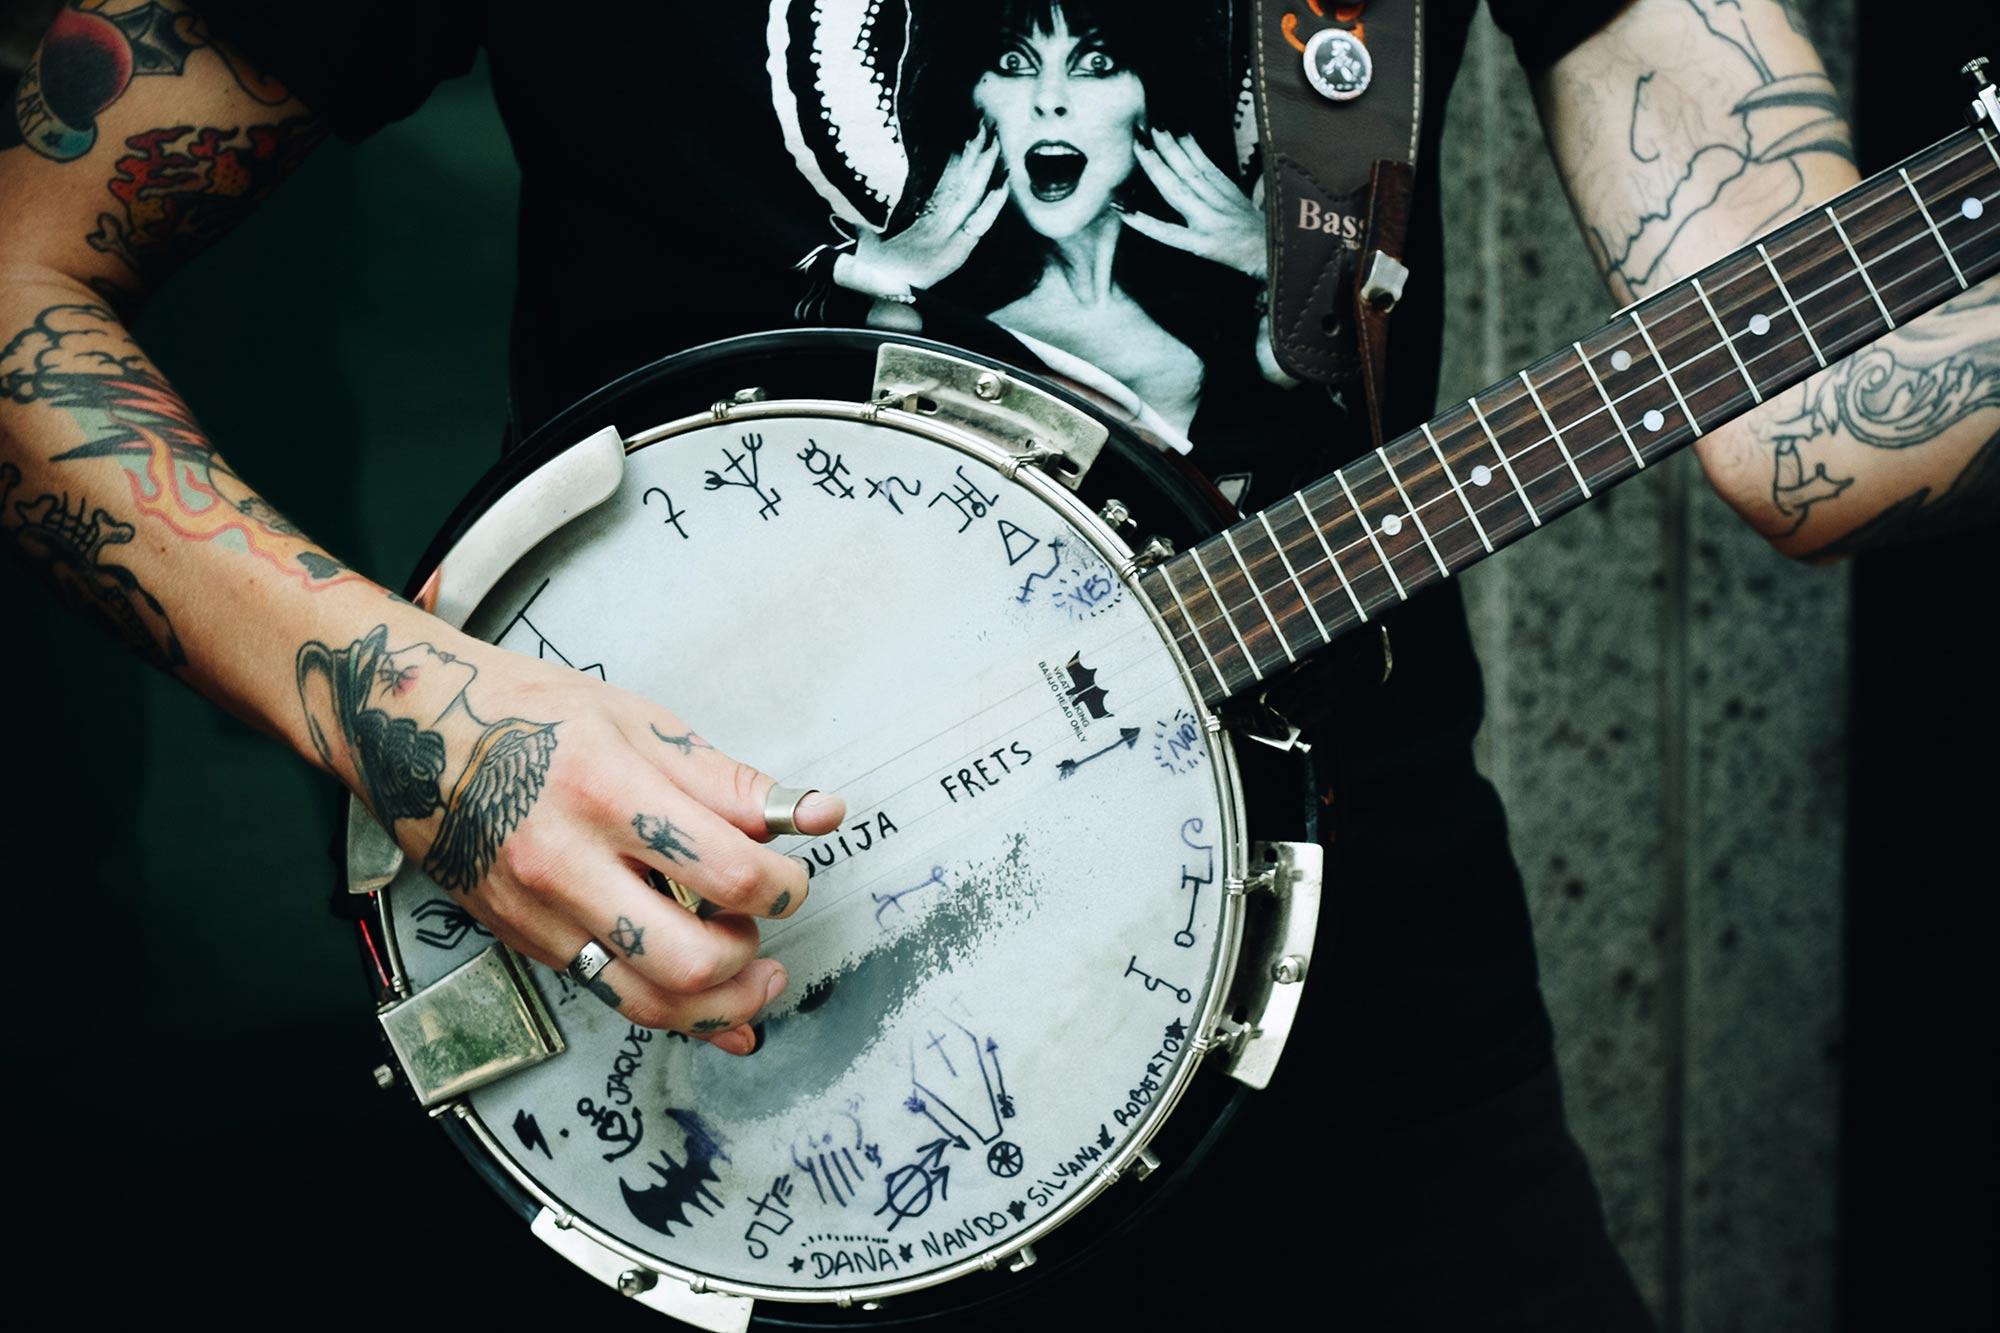 Homme tatouage jouant banjo